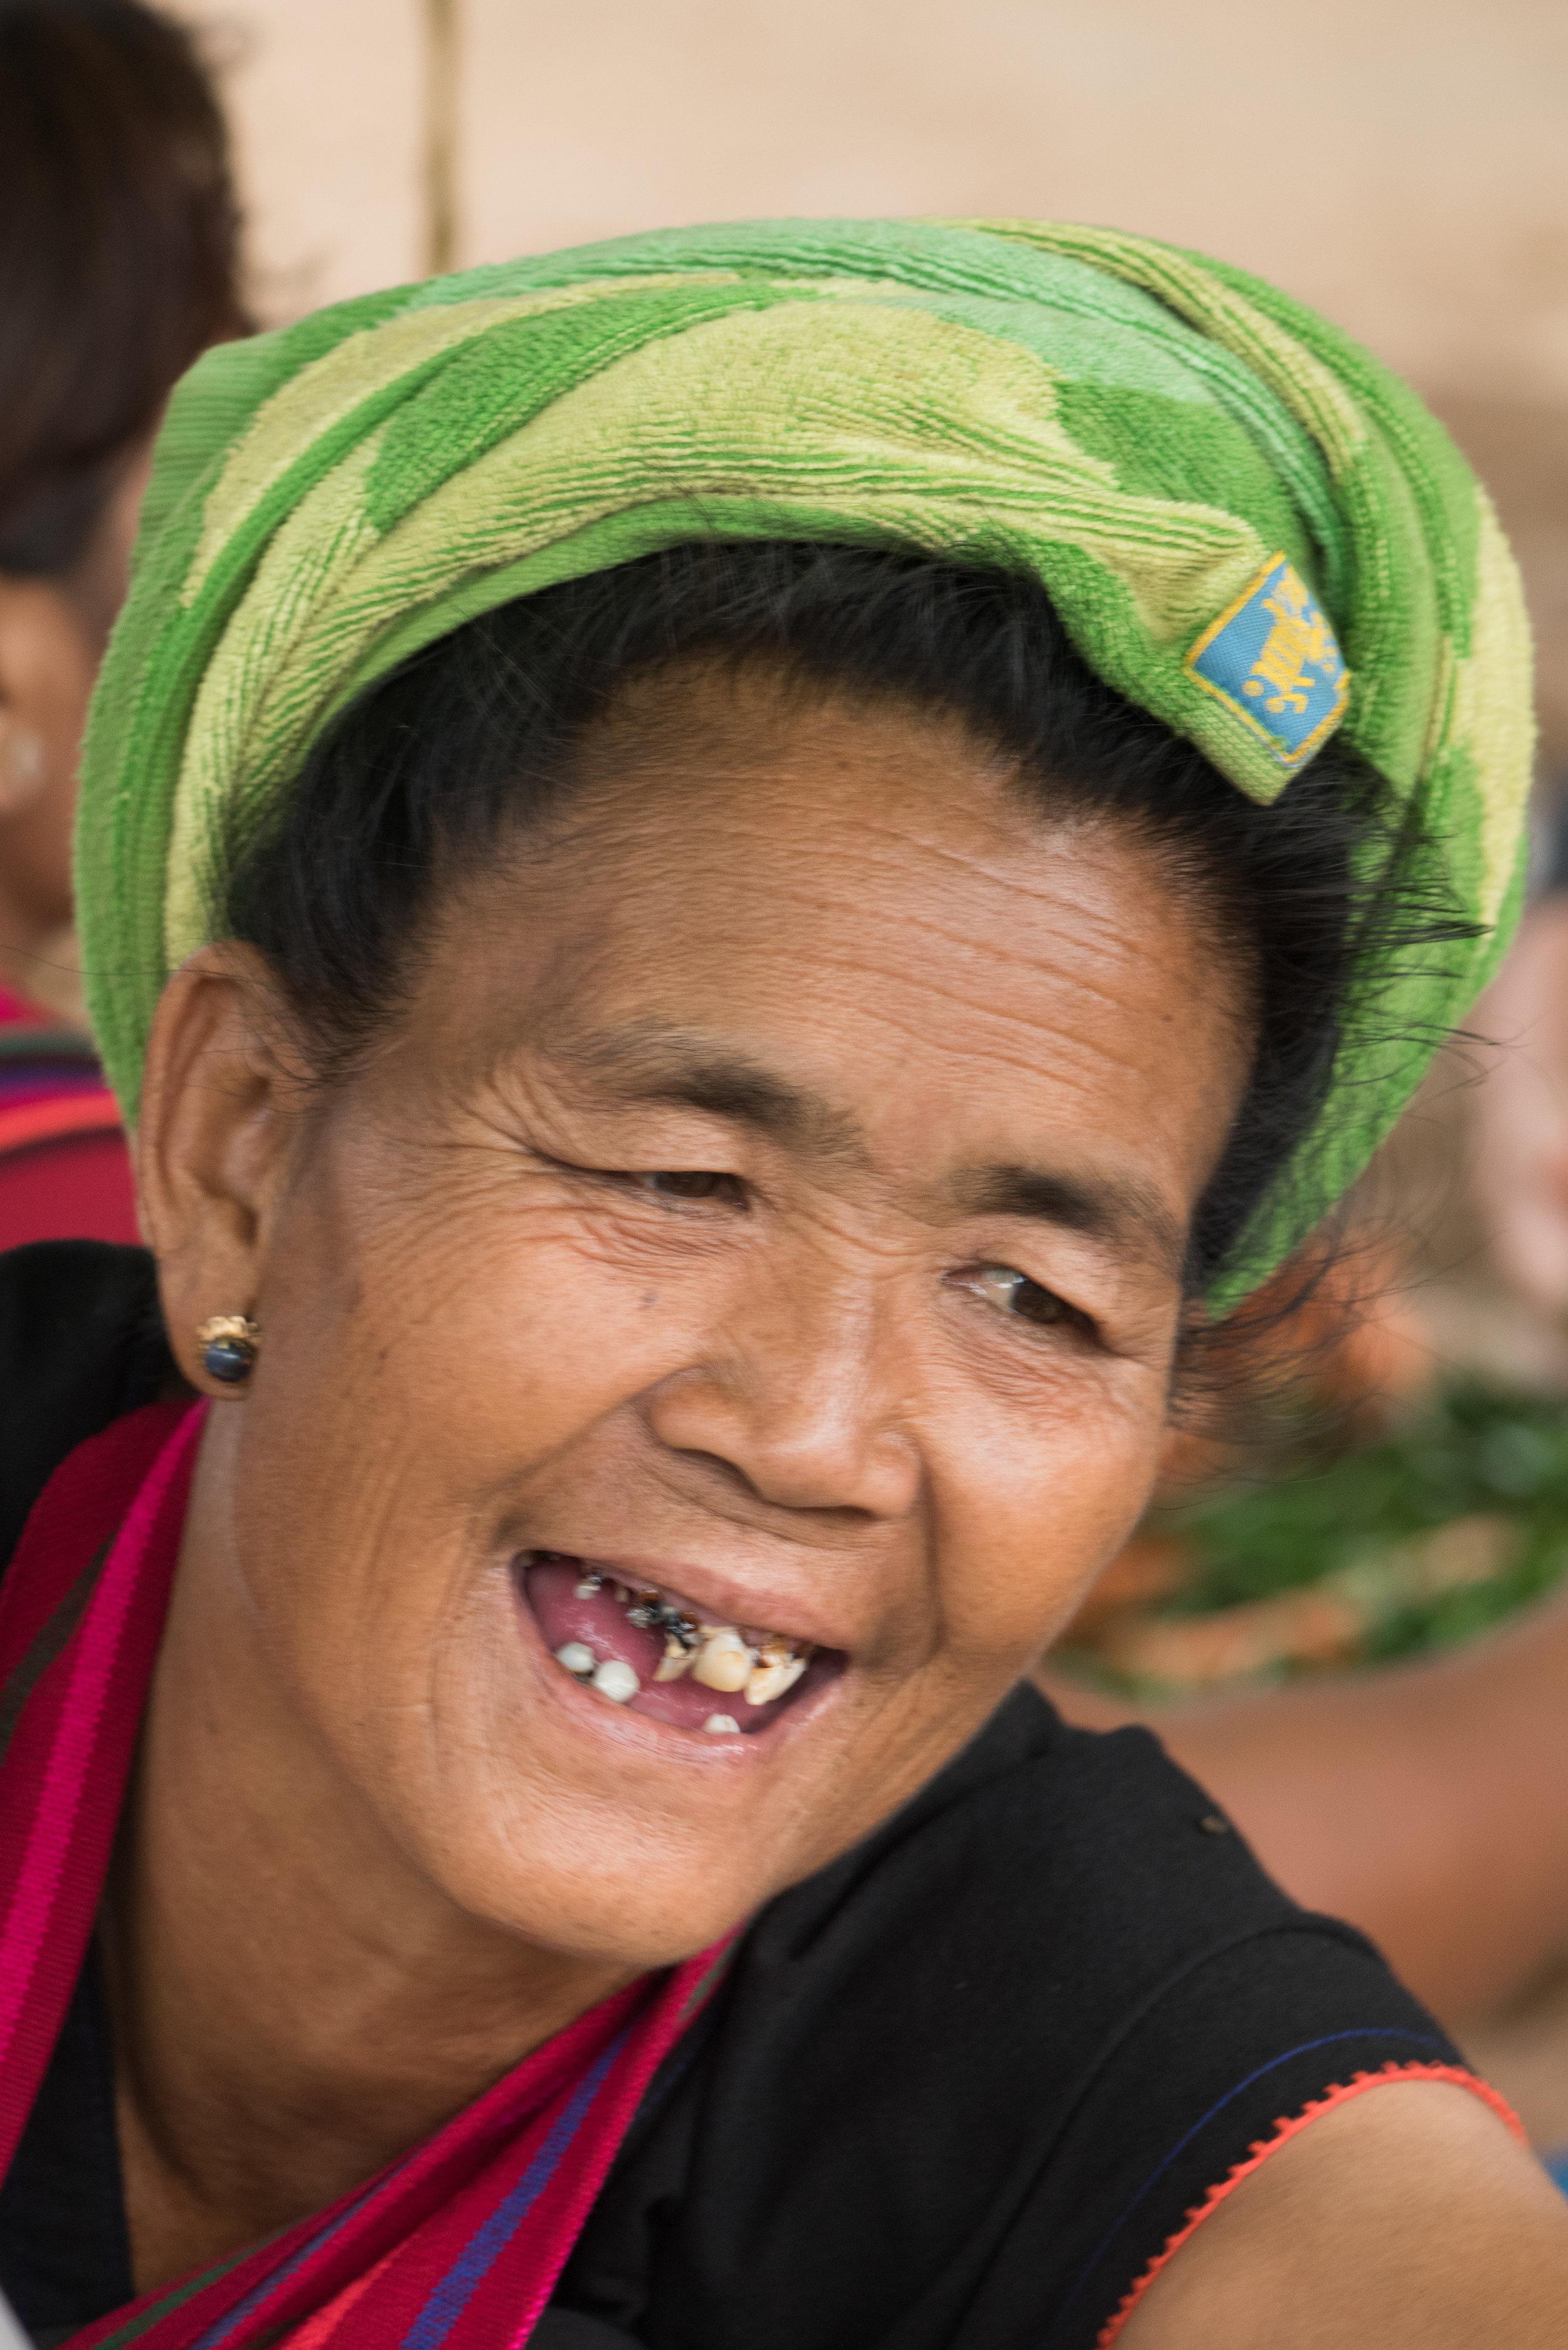 Lady at Market, Phaung Daw Oo Pagoda, Inle Lake, Myanmar